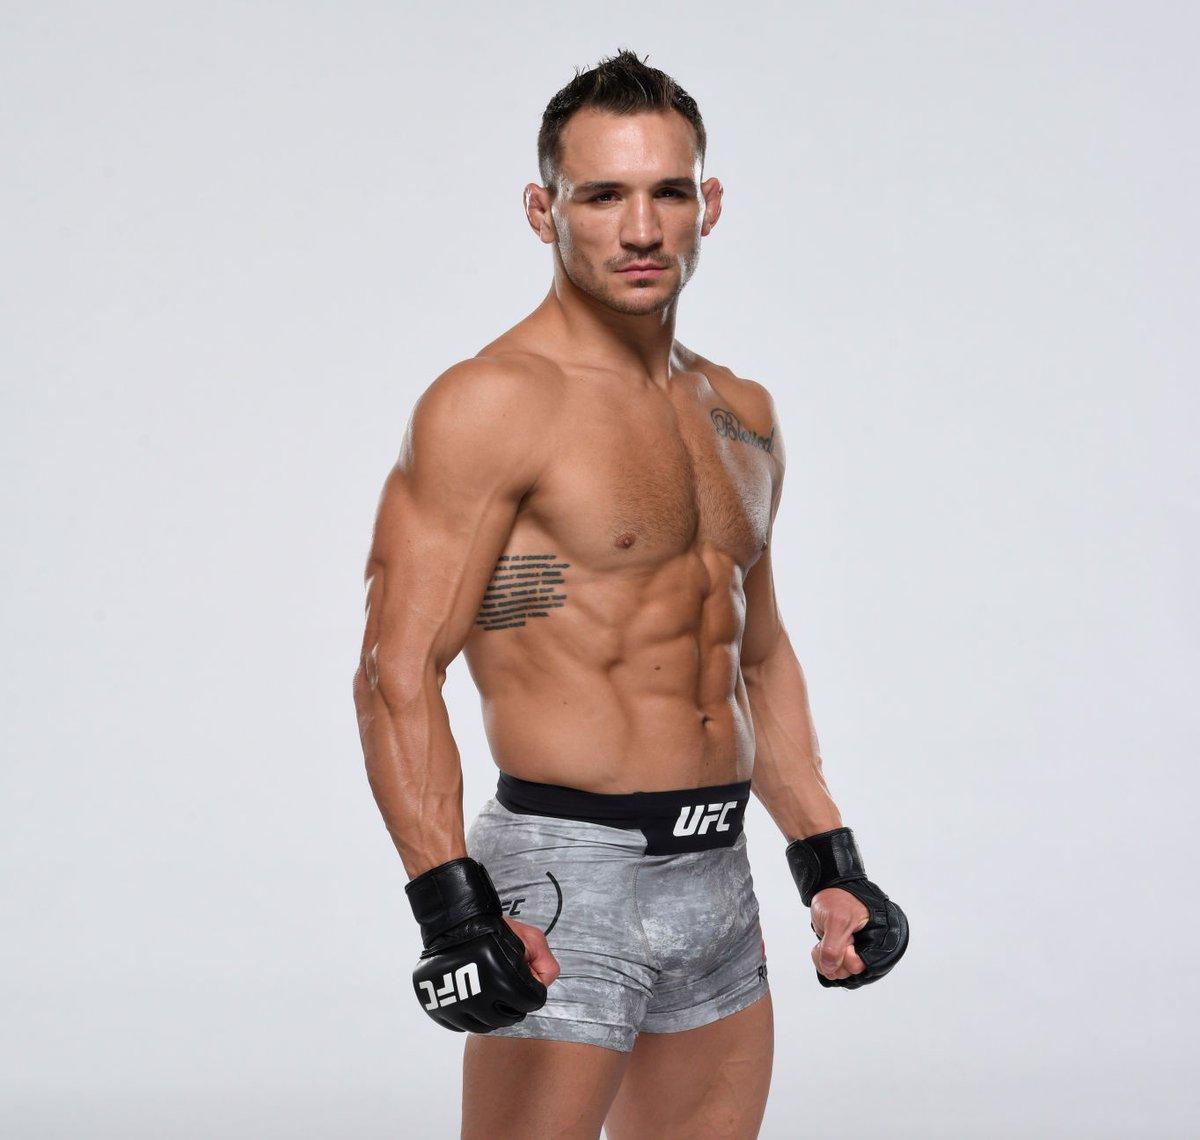 Michael Chandler def. Dan Hooker via TKO (Round 1, 02:30)  #conorvsdustin2 #ufc257 #dustinpoirier #ufcfightisland #hookervschandler #mma #ufc #boxing #bjj #muaythai #kickboxing #jiujitsu #fitness #martialarts #wrestling #fight #grappling #karate #fighter #training #mmafighter